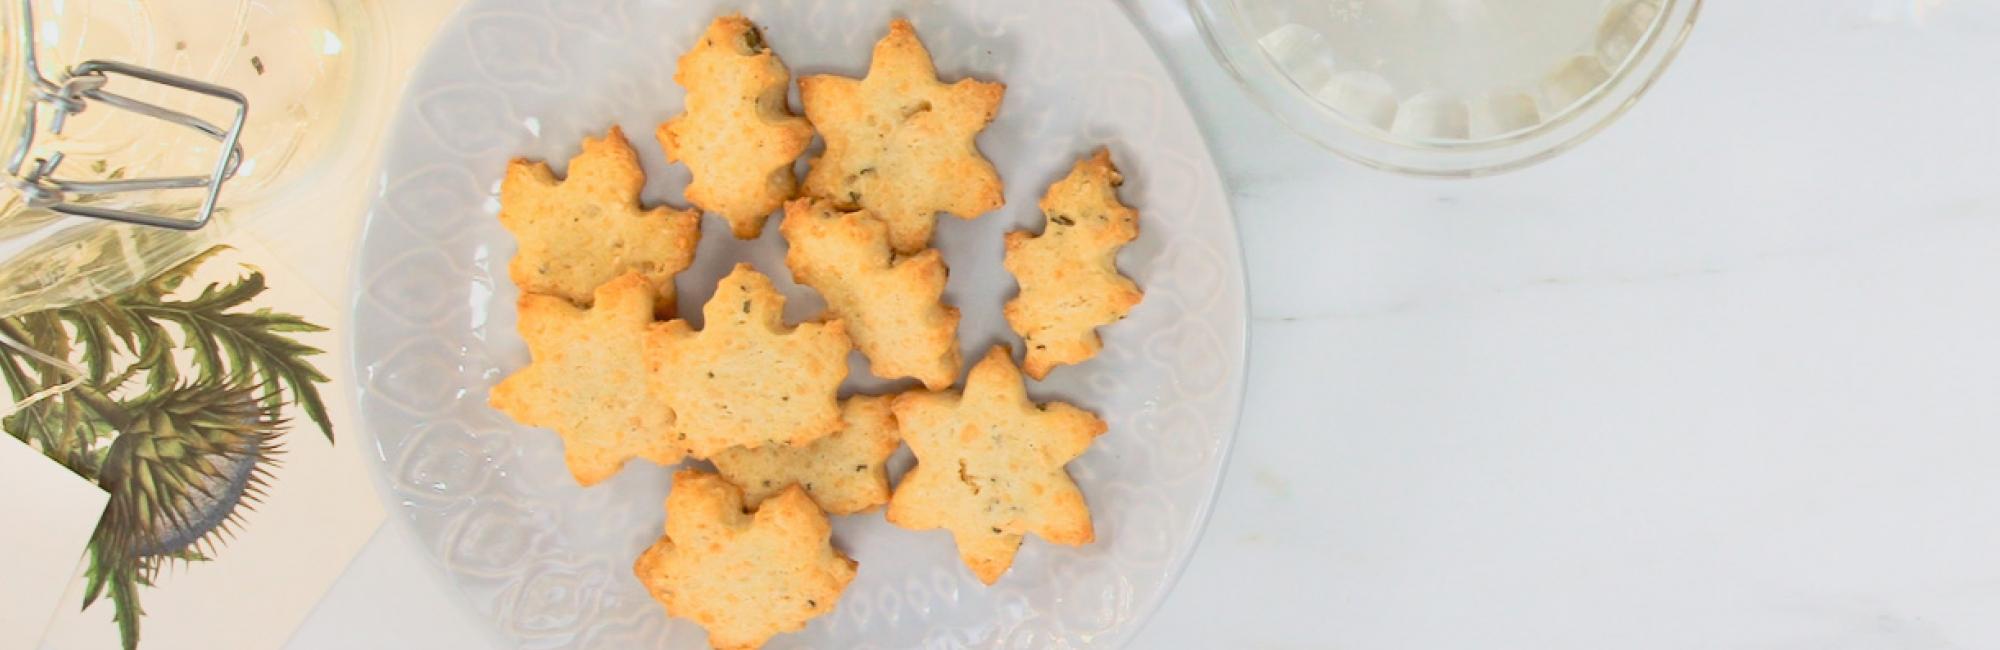 Zandkoekjes, rozemarijn, parmezaanse kaas